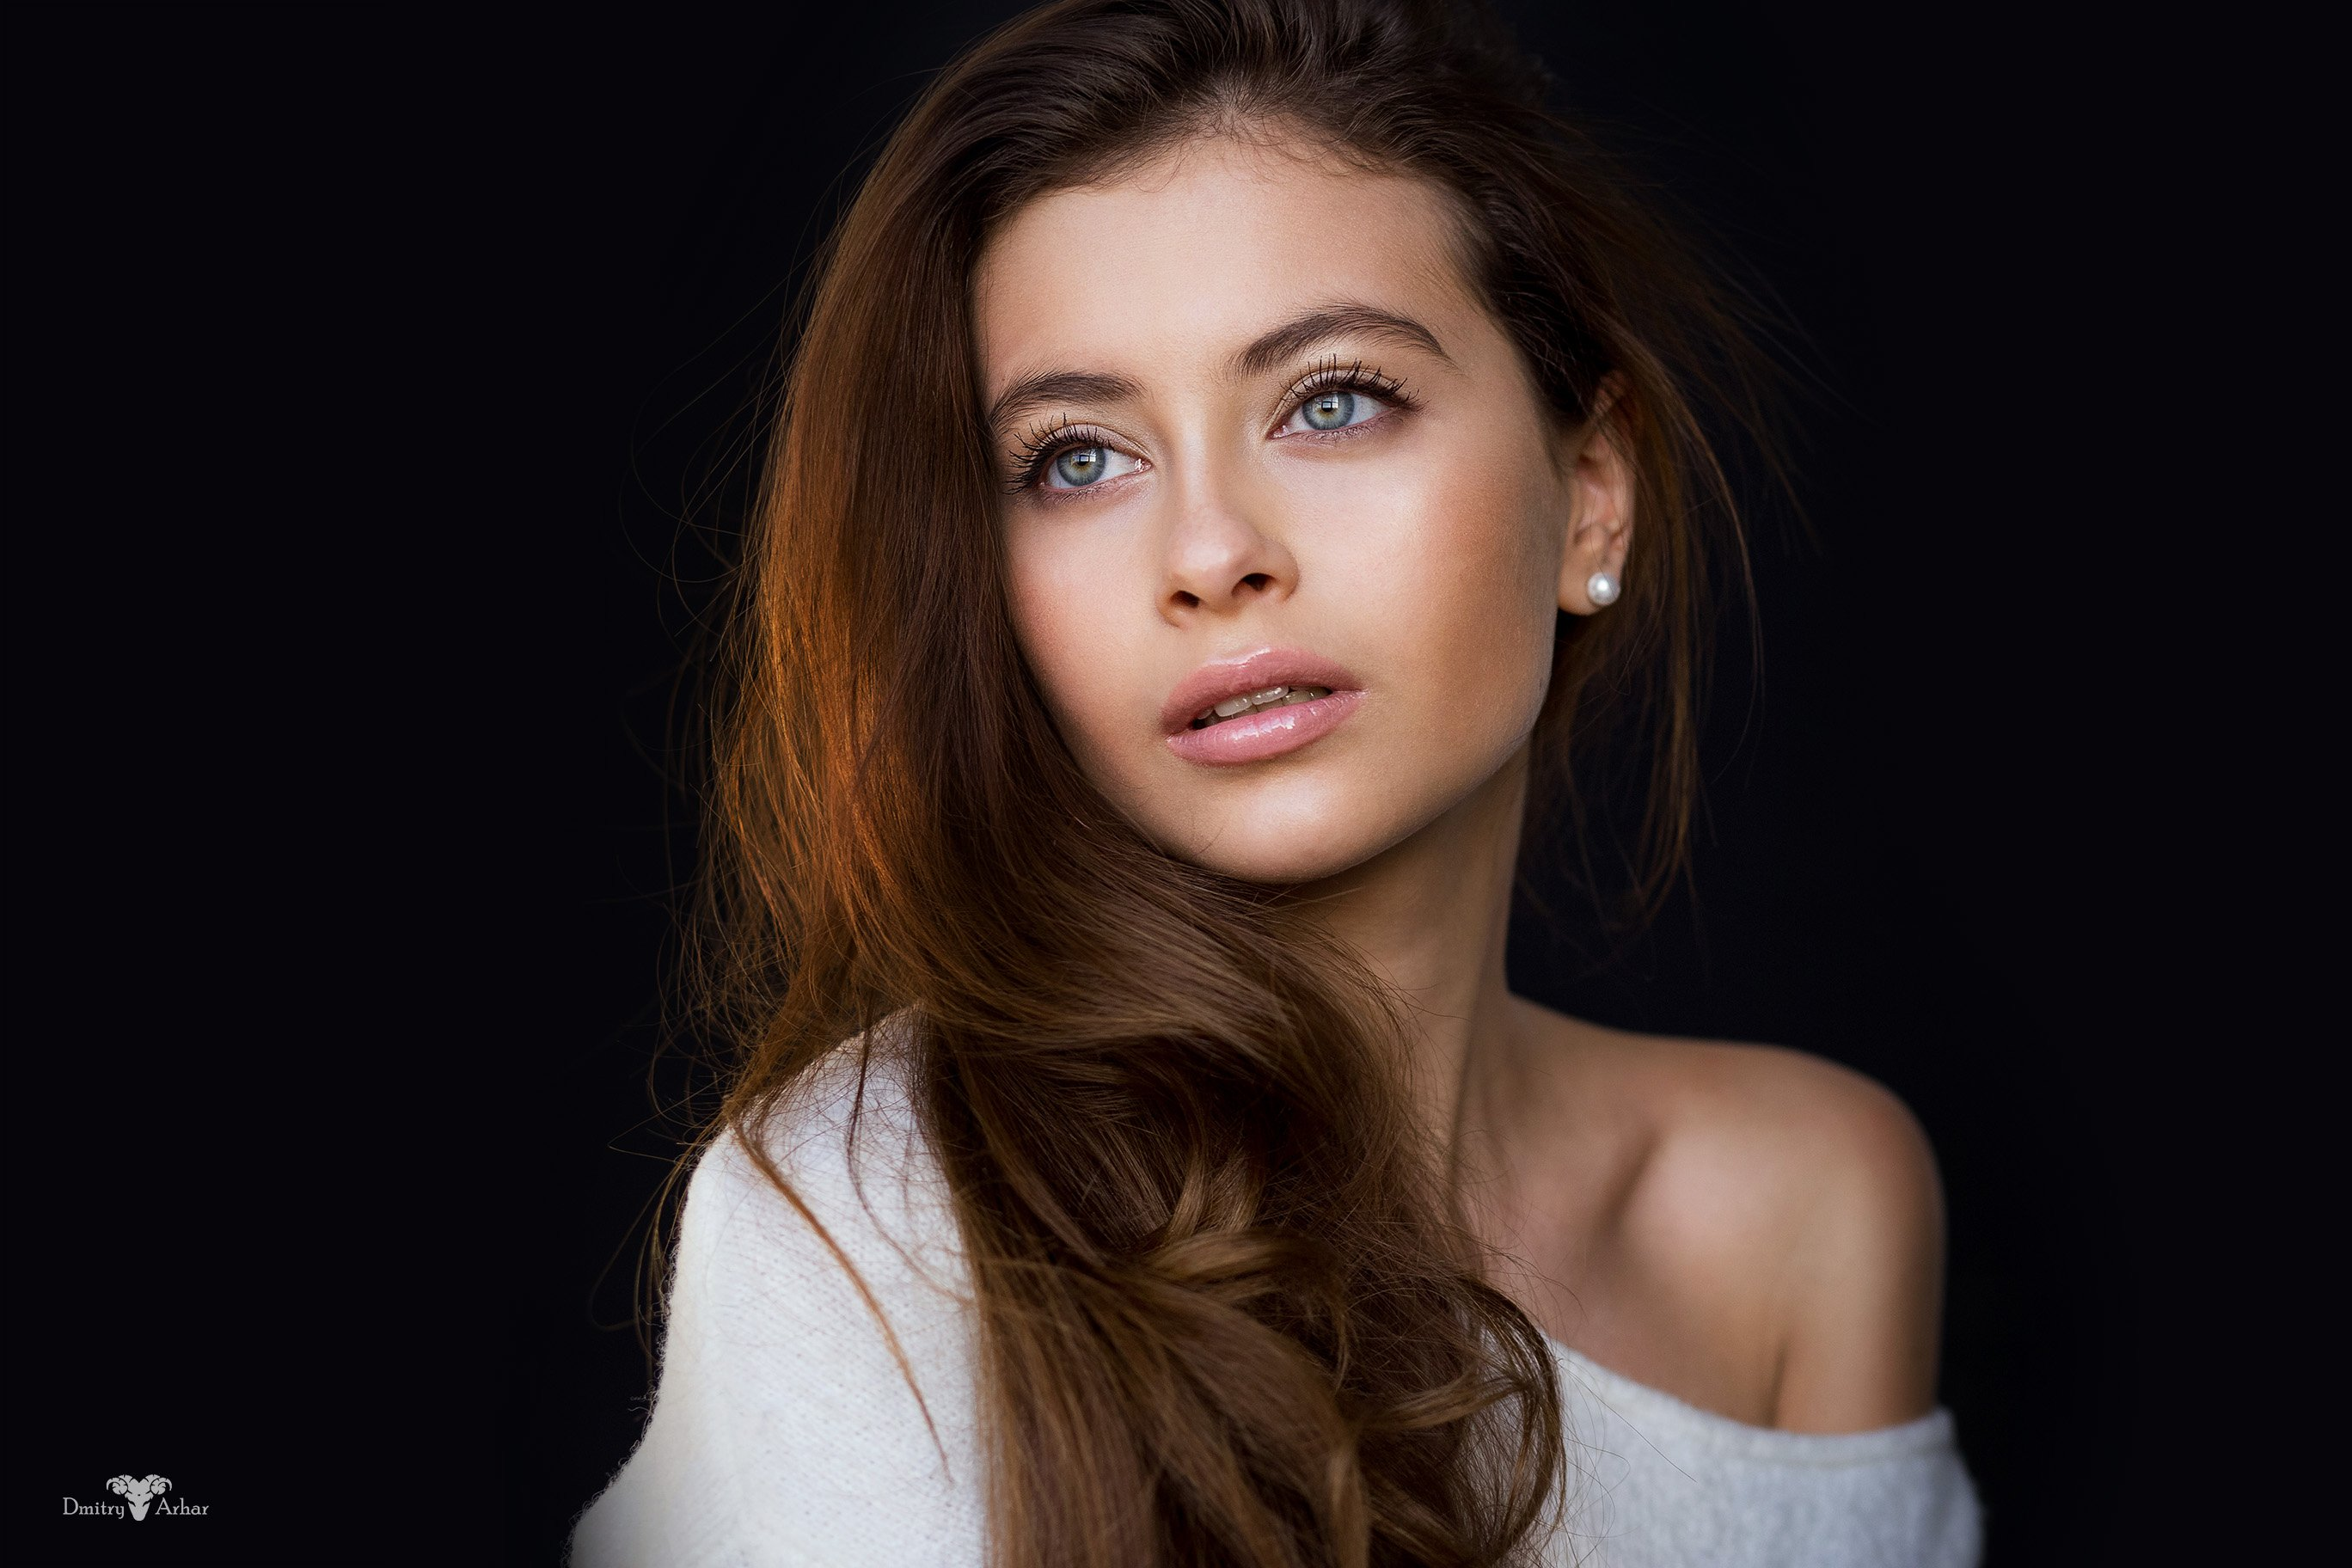 Beautiful, Beauty, Dmitry Arhar, Girl, Glamour, Look, Model, People, Photo, Portrait, Portret, Woman, Девушка, Модель, Портрет, Портрет девушки, Портфолио, Фотосессия, Dmitry Arhar